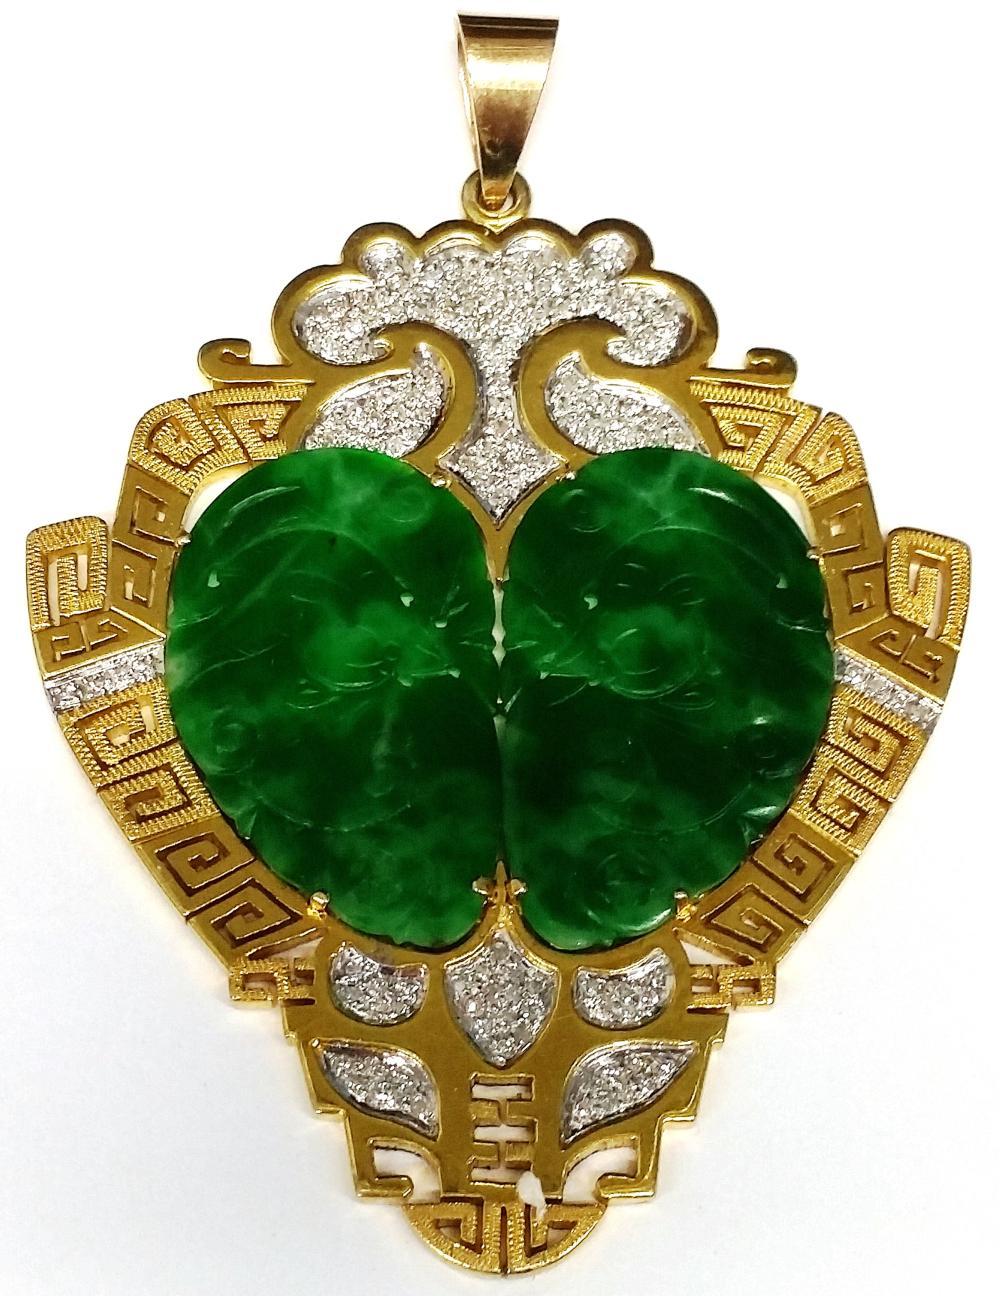 2ctw Diamond Ancient Natural Jadeite Jade In 1950s Modern 14K Gold Mounting